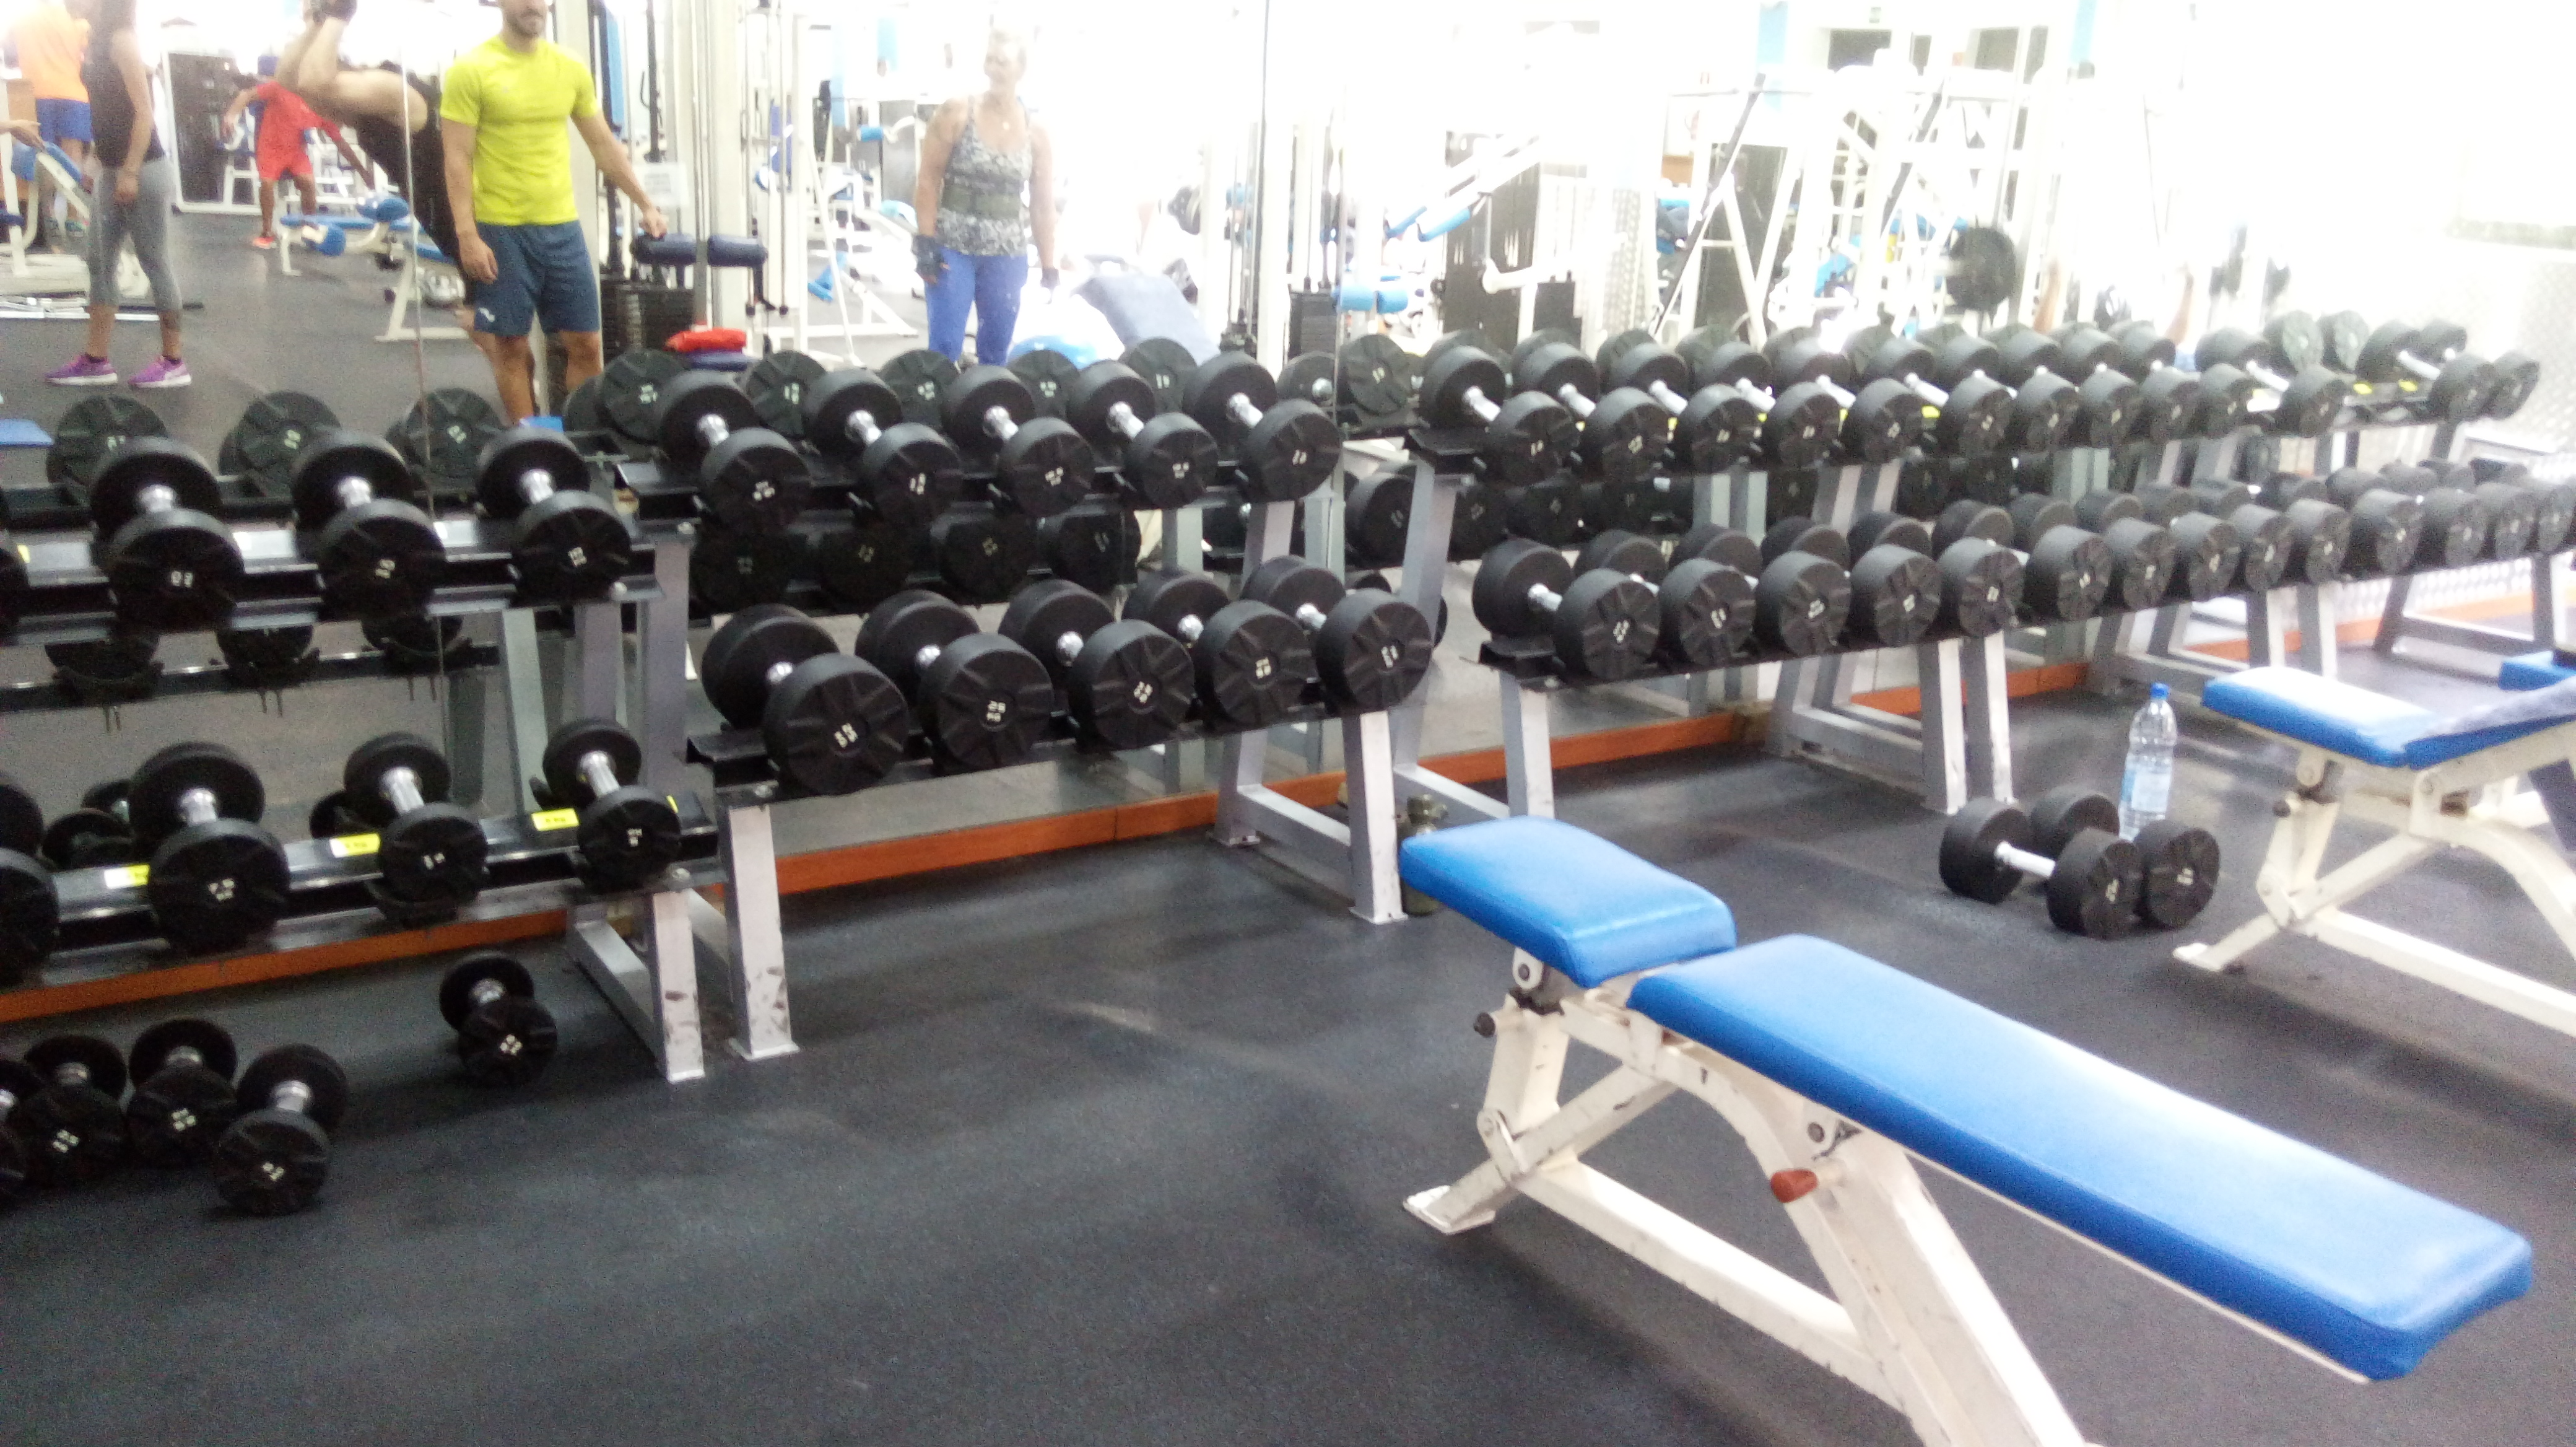 El gimnasio del centro deportivo ingenio renueva sus for Gimnasio del centro